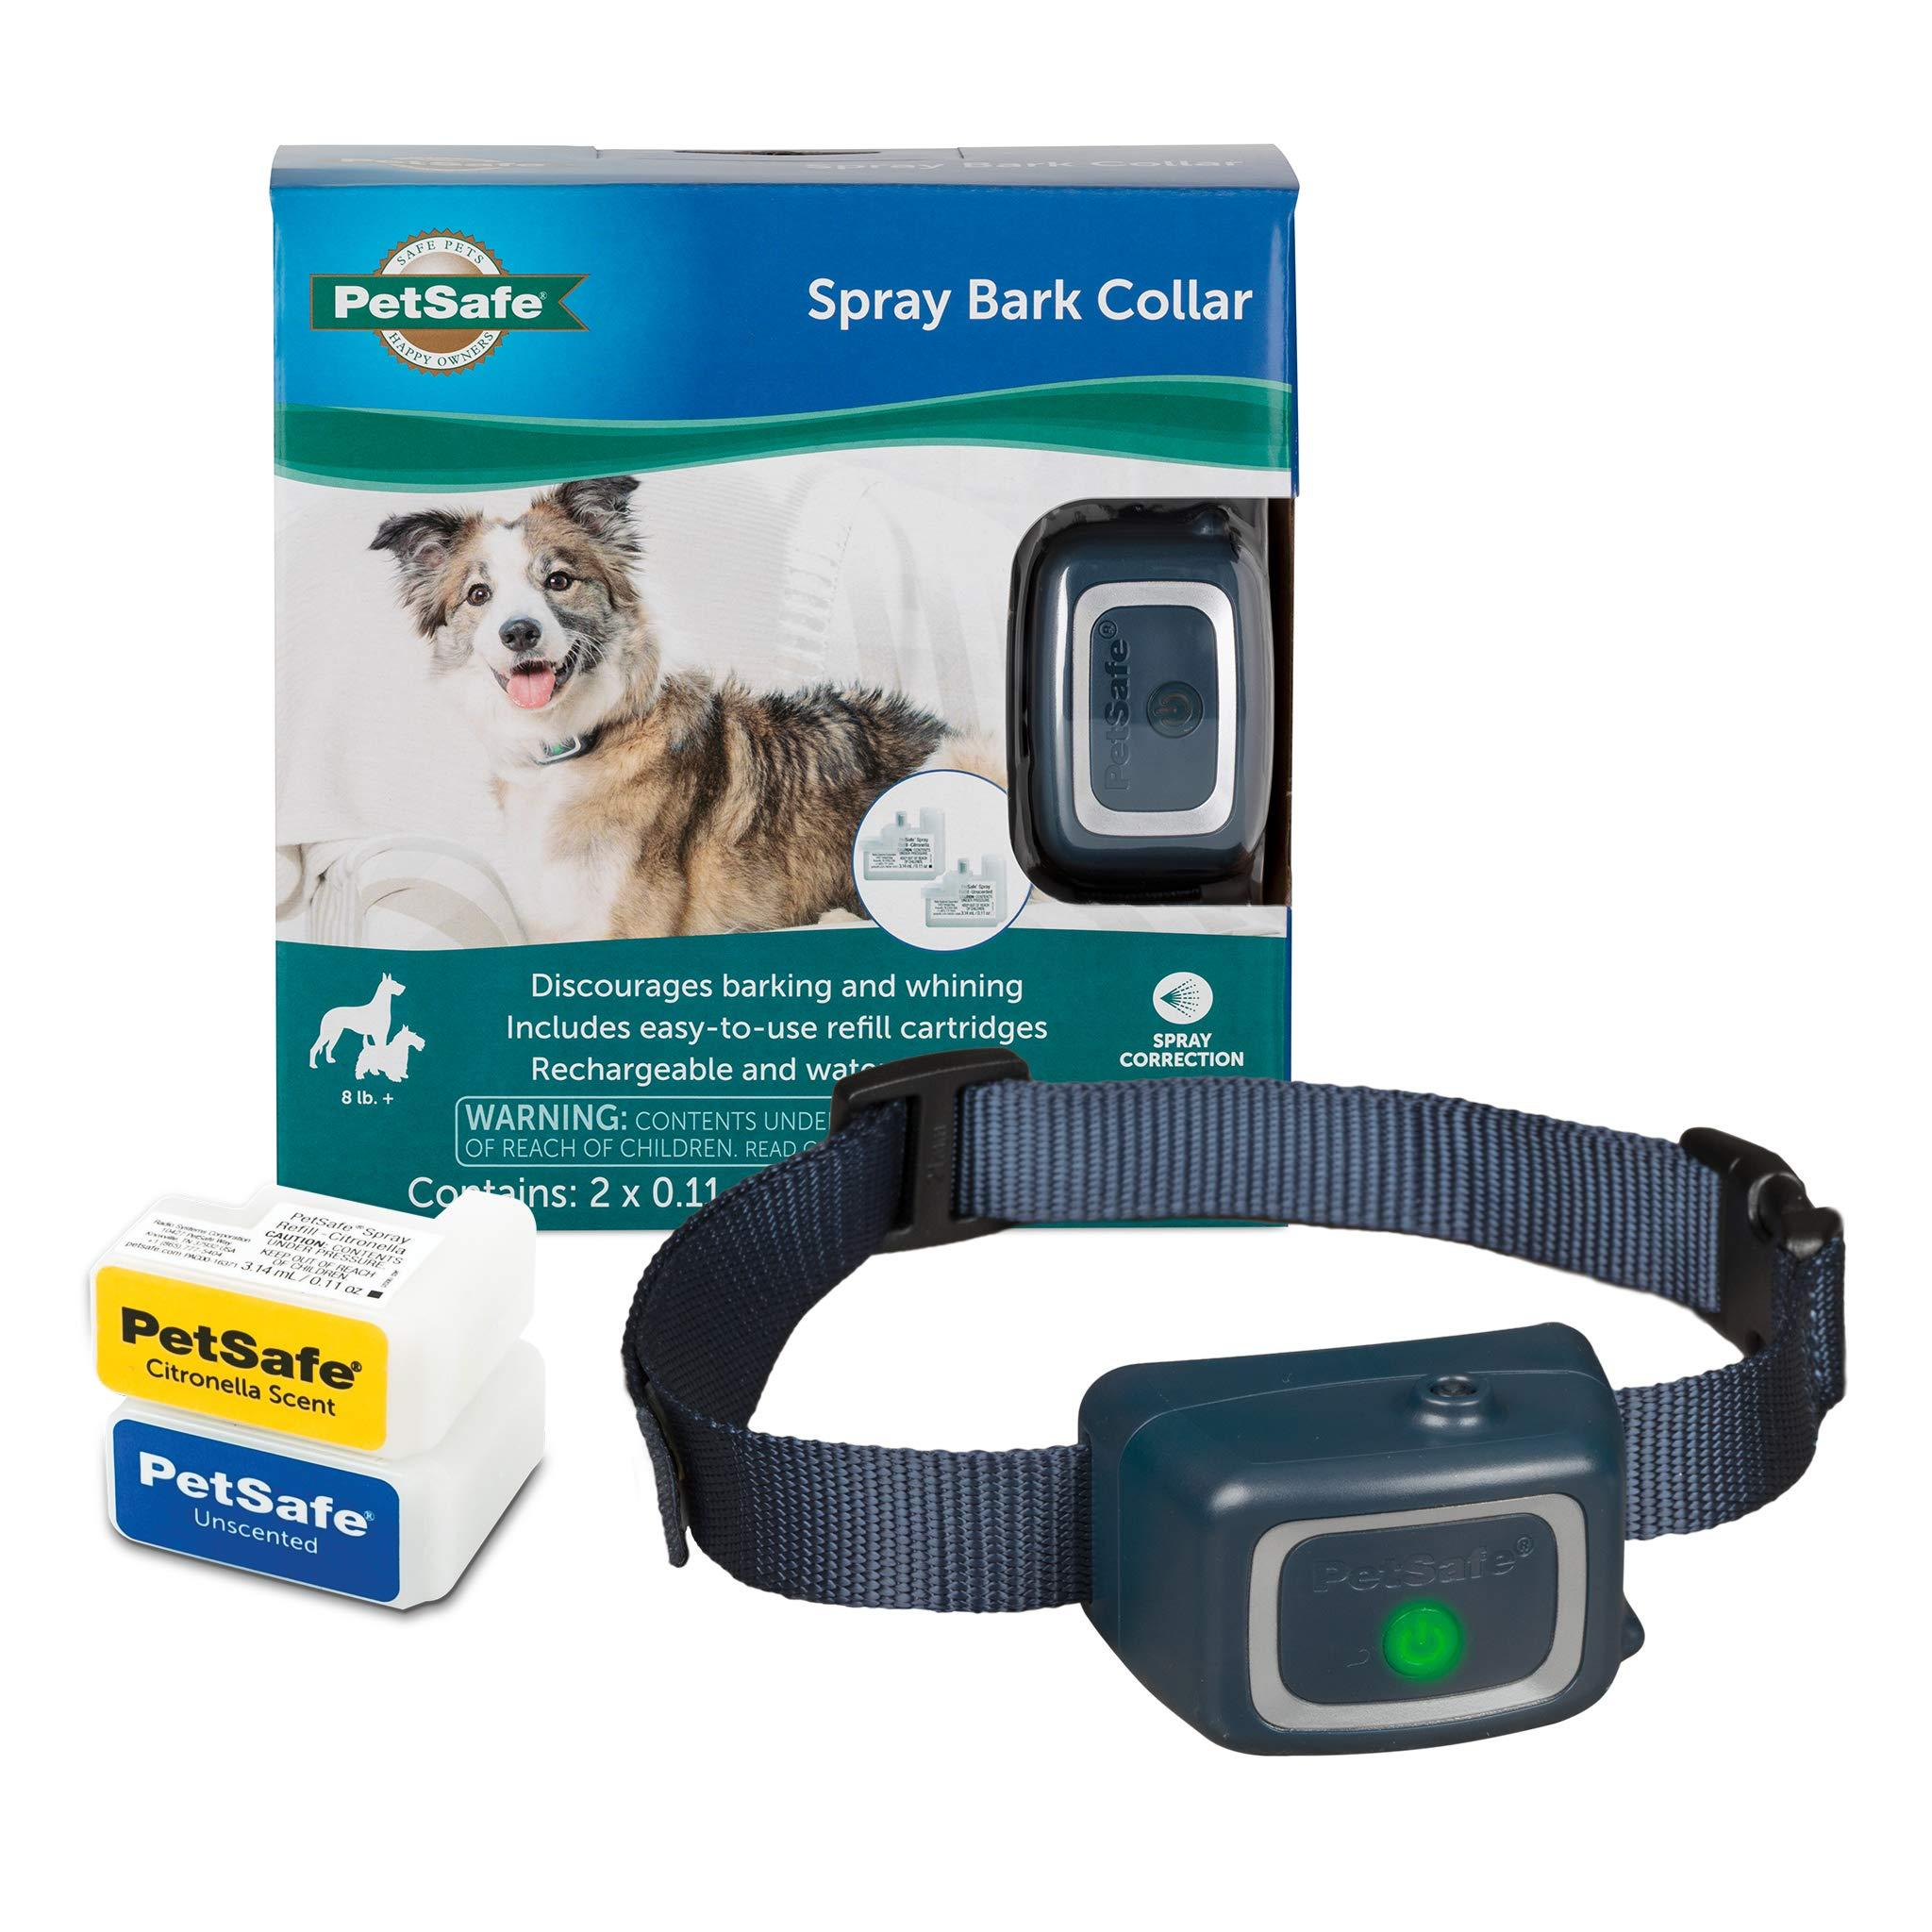 PetSafe Spray Bark Control Dog Collar